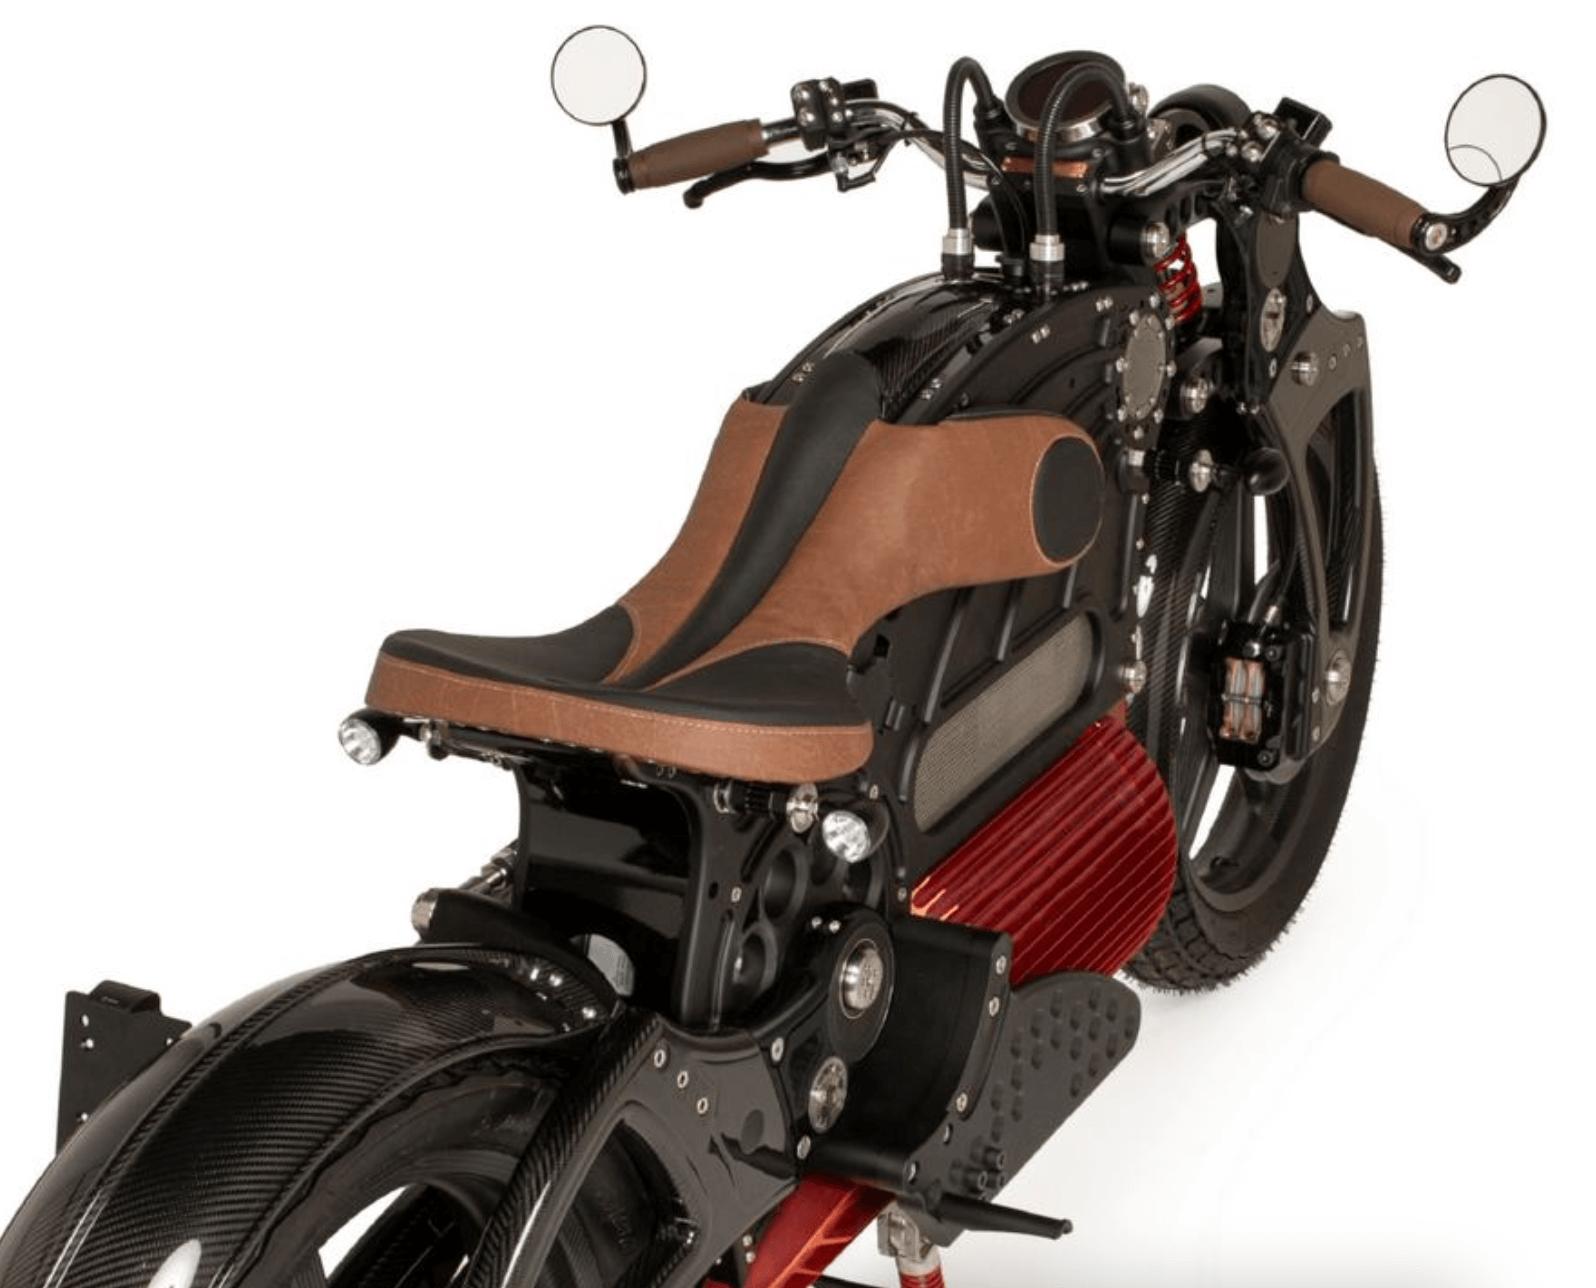 CURTISS MOTORCYCLES, ELEKTRİKLİ MOTORSİKLET TASARIM bilgi